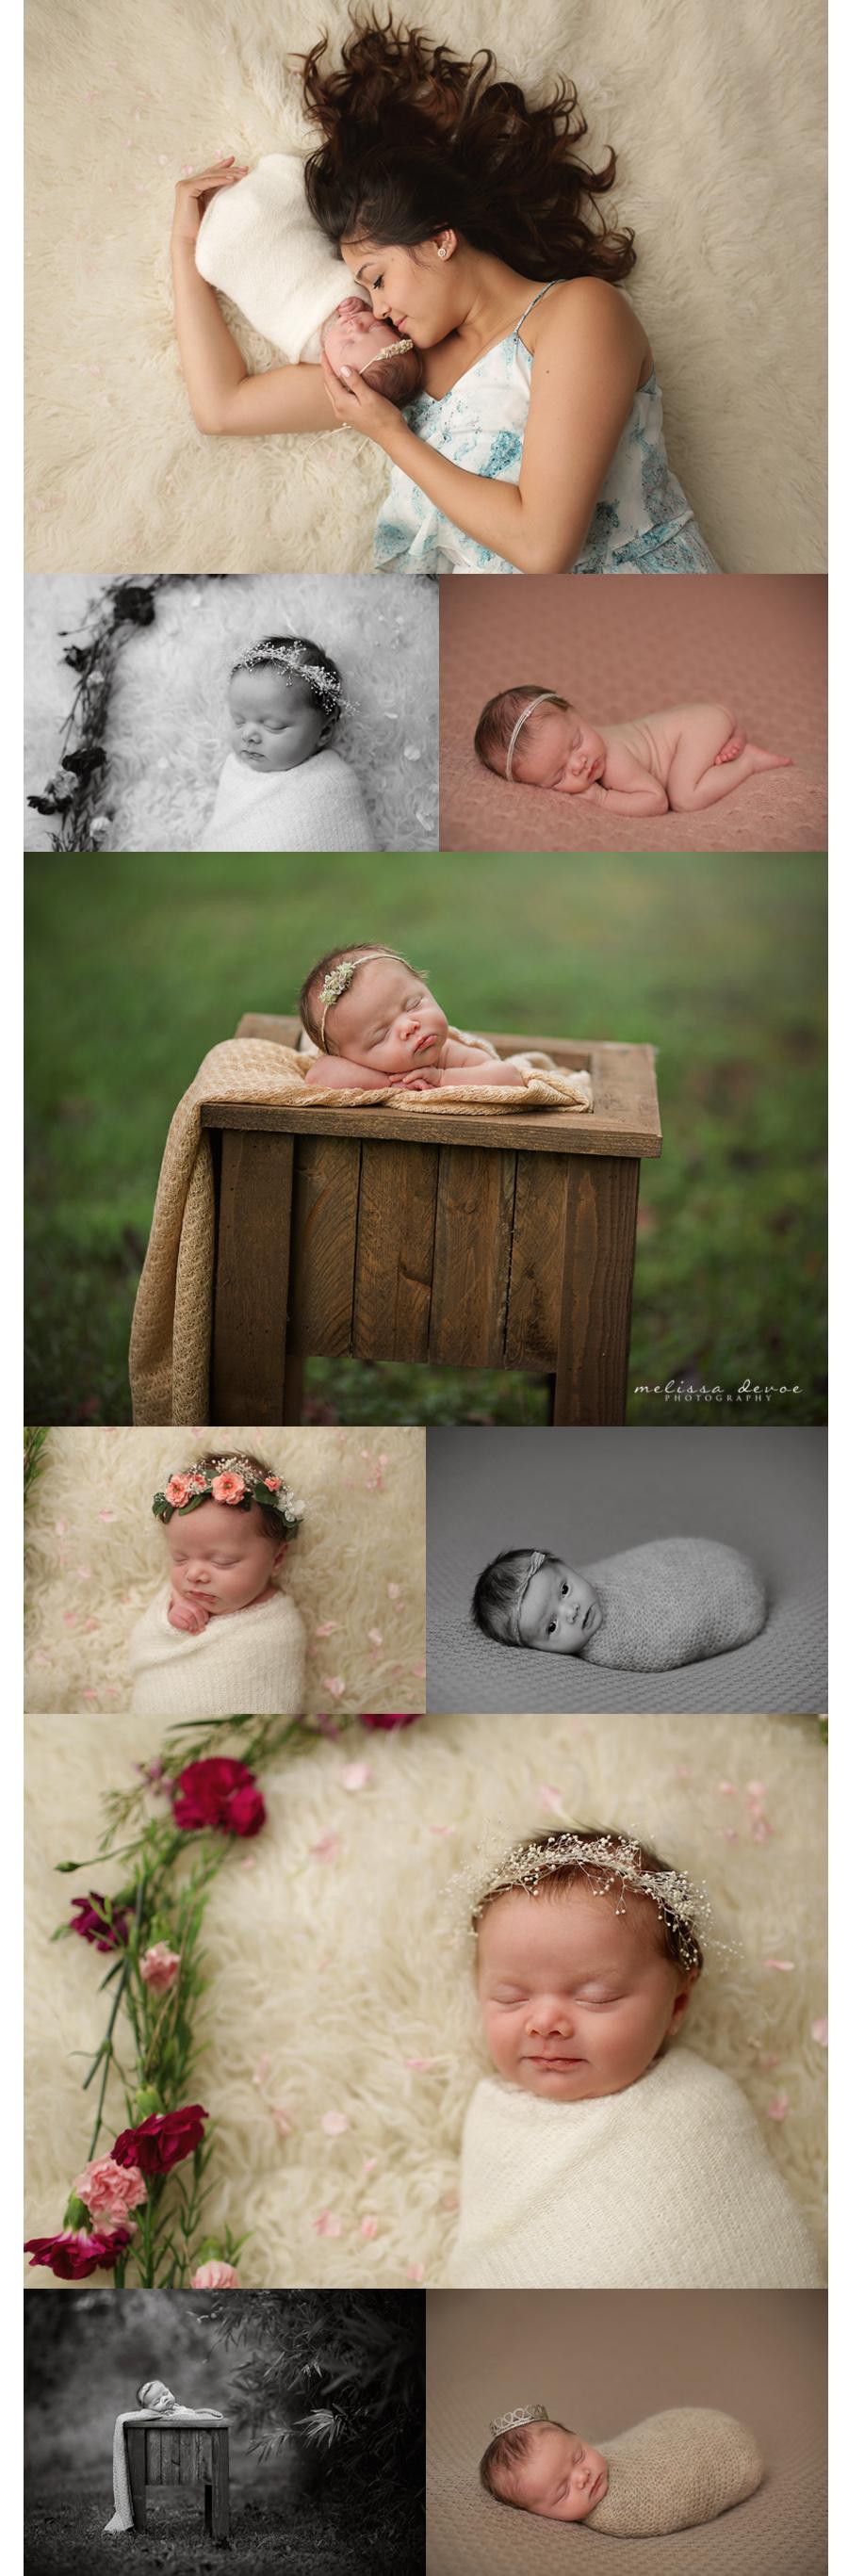 Melissa DeVoe Photography Raleigh NC Newborn Baby Photographer 3